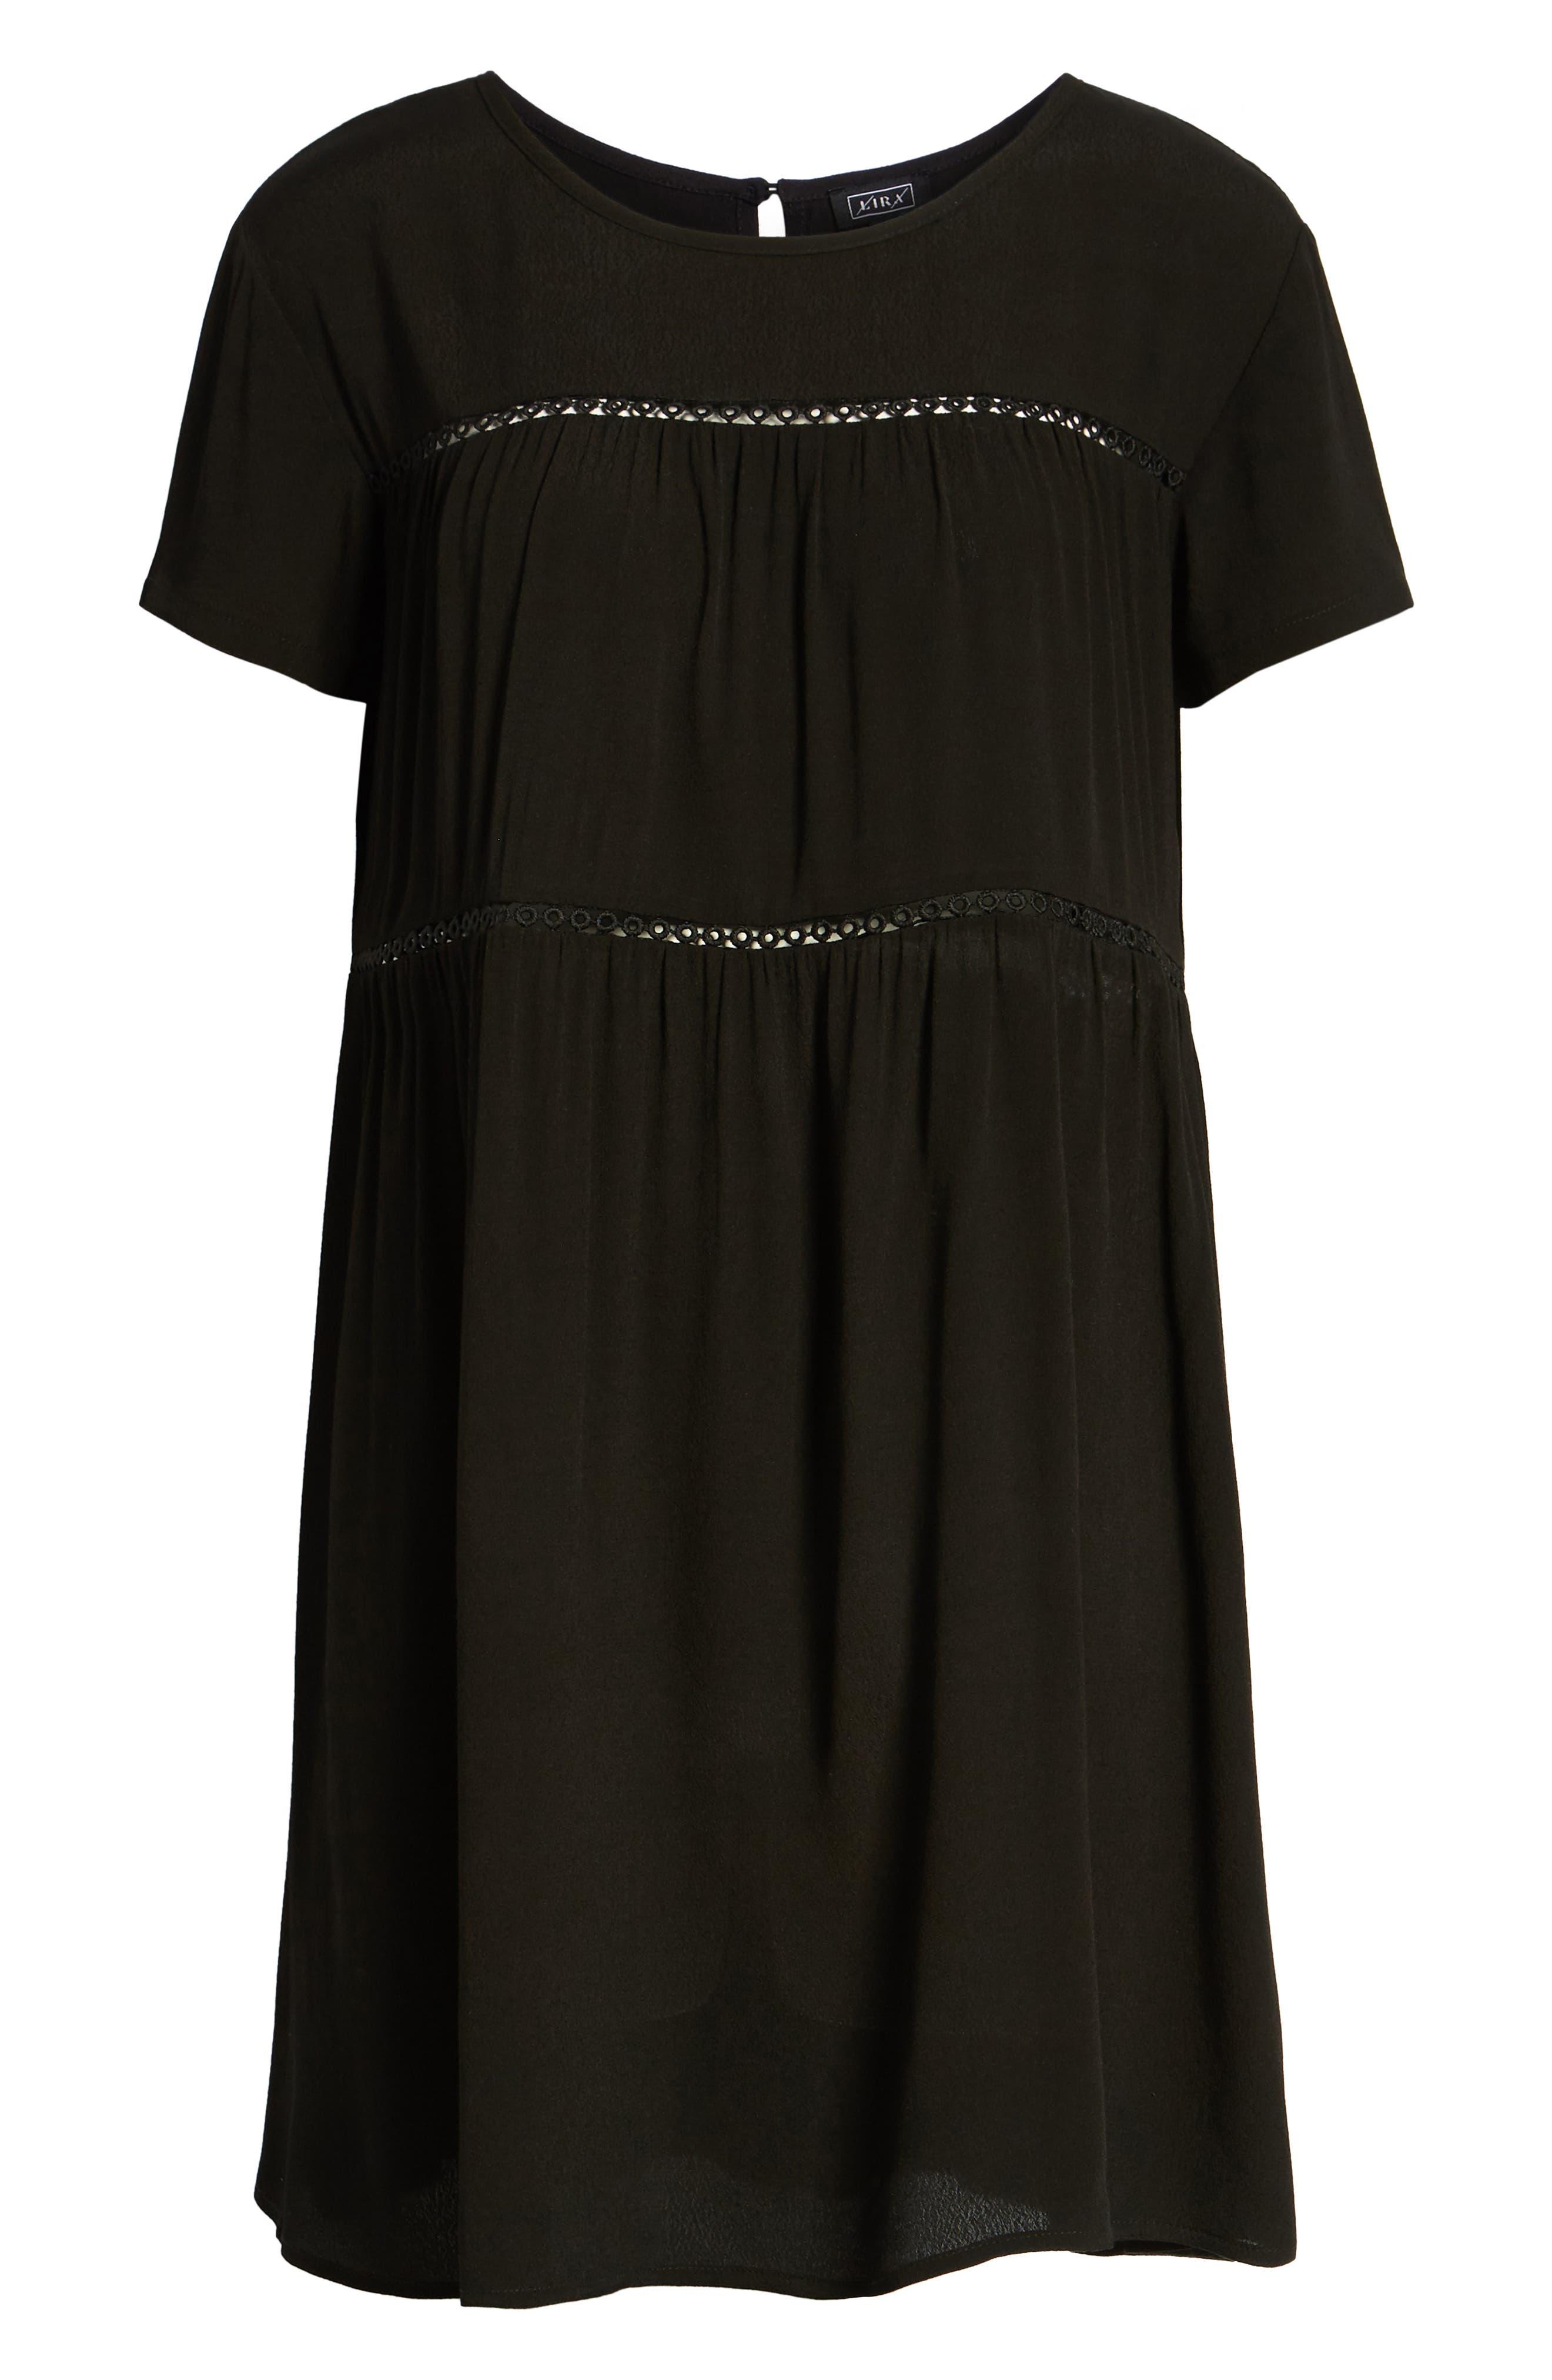 LIRA CLOTHING,                             Amelia Silk Blend Babydoll Dress,                             Alternate thumbnail 7, color,                             BLACK